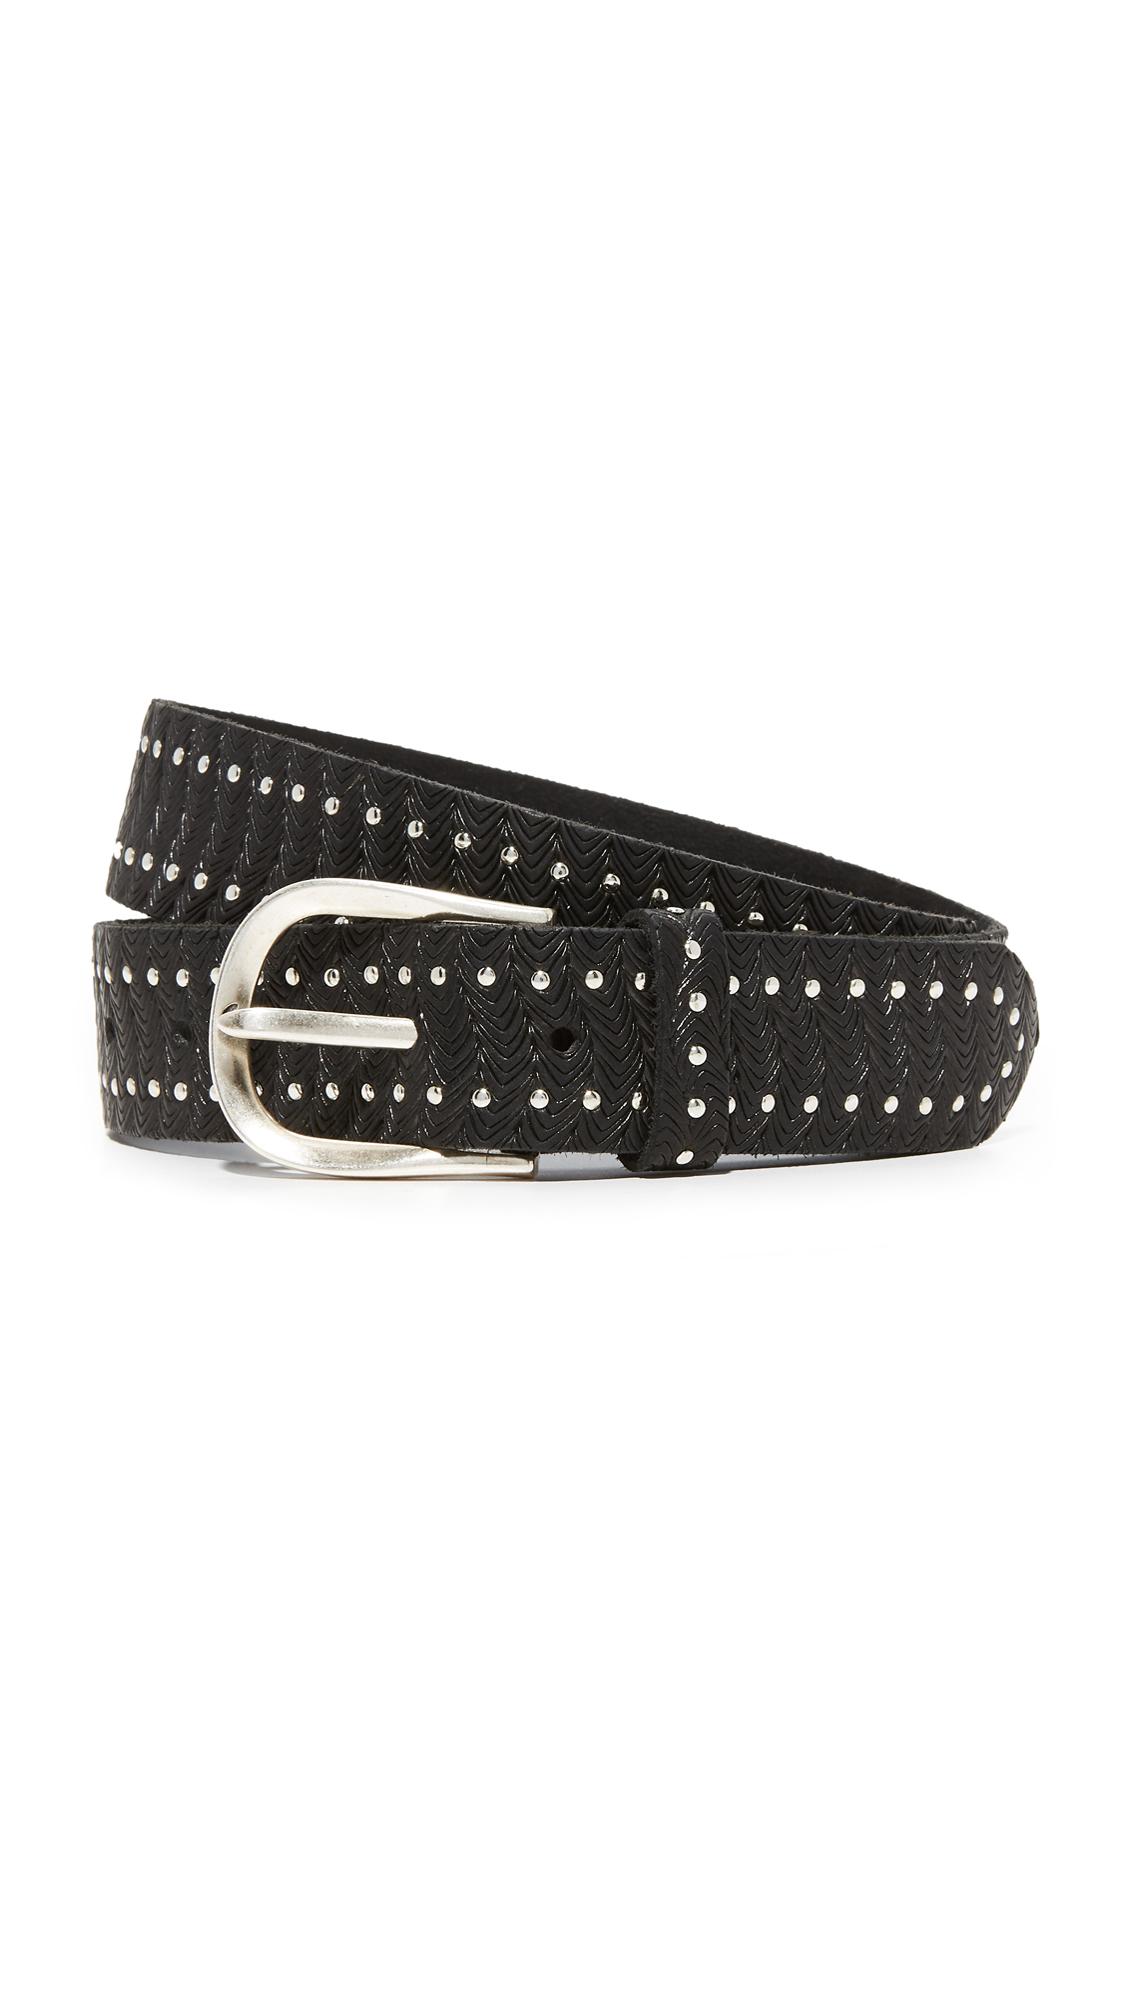 B. Belt Mini Border Studs Embossed Belt - Black